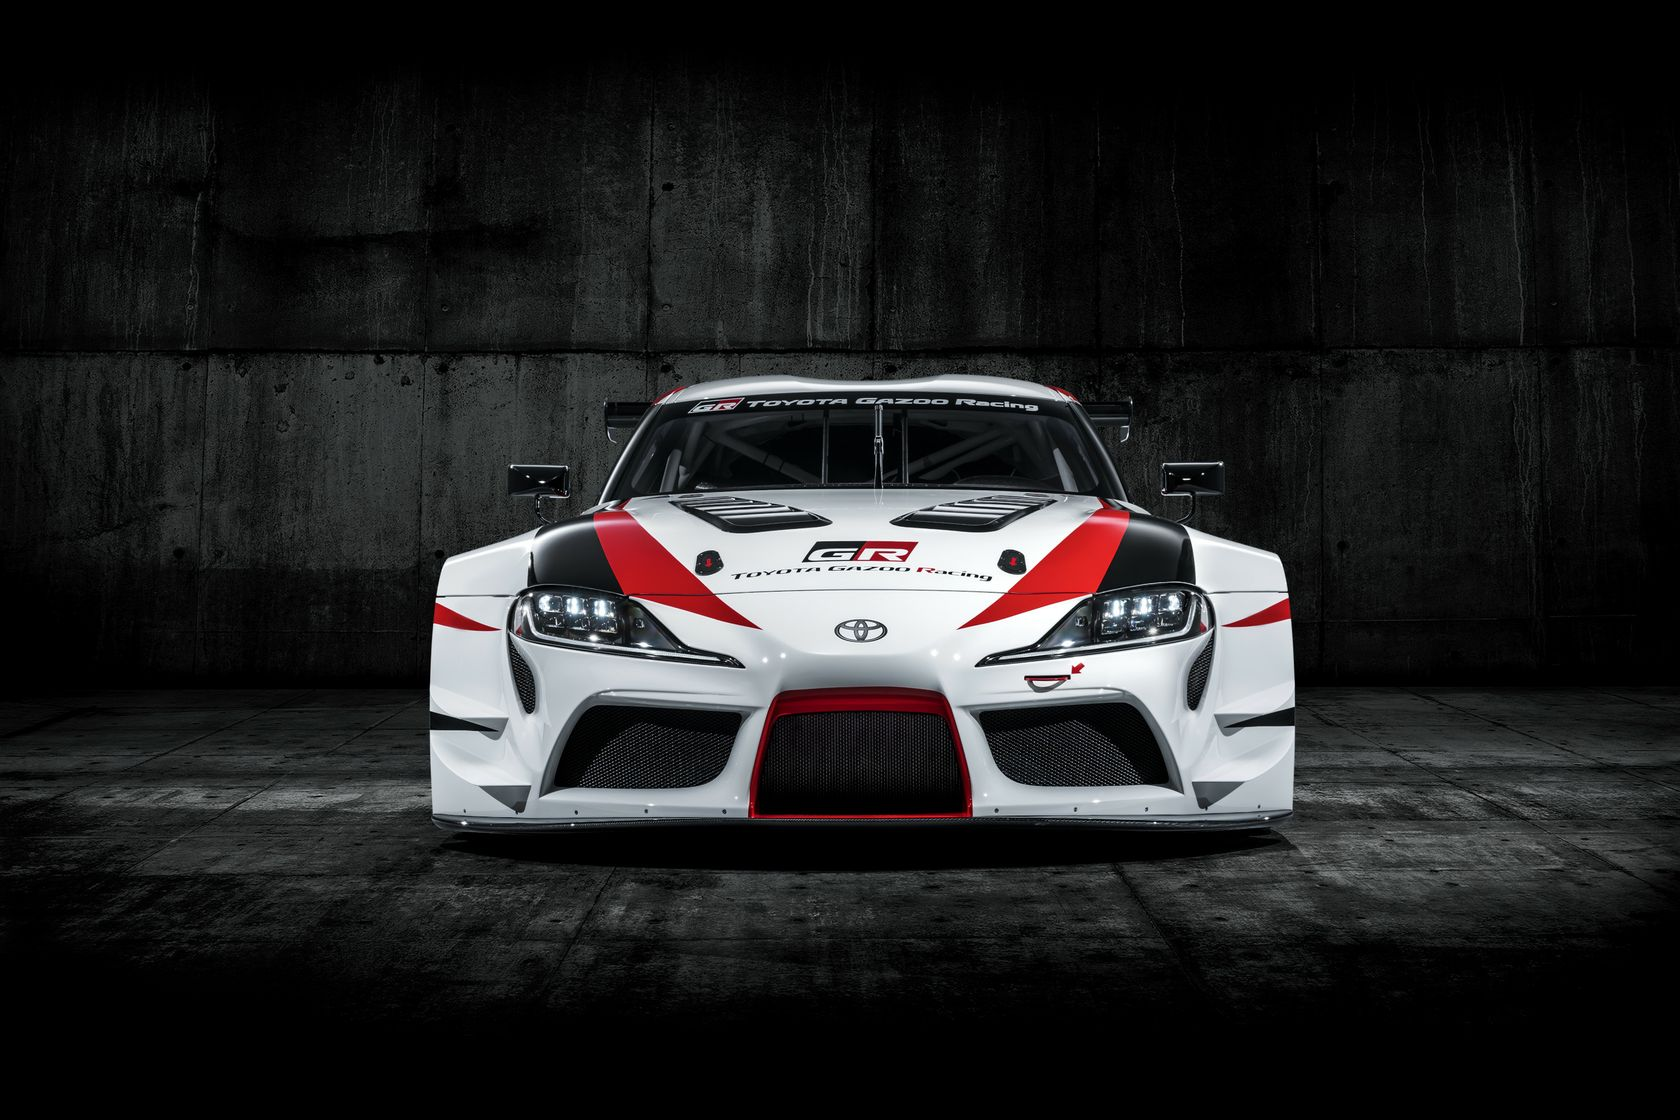 GR Supra Racing Concept - Studio - 01